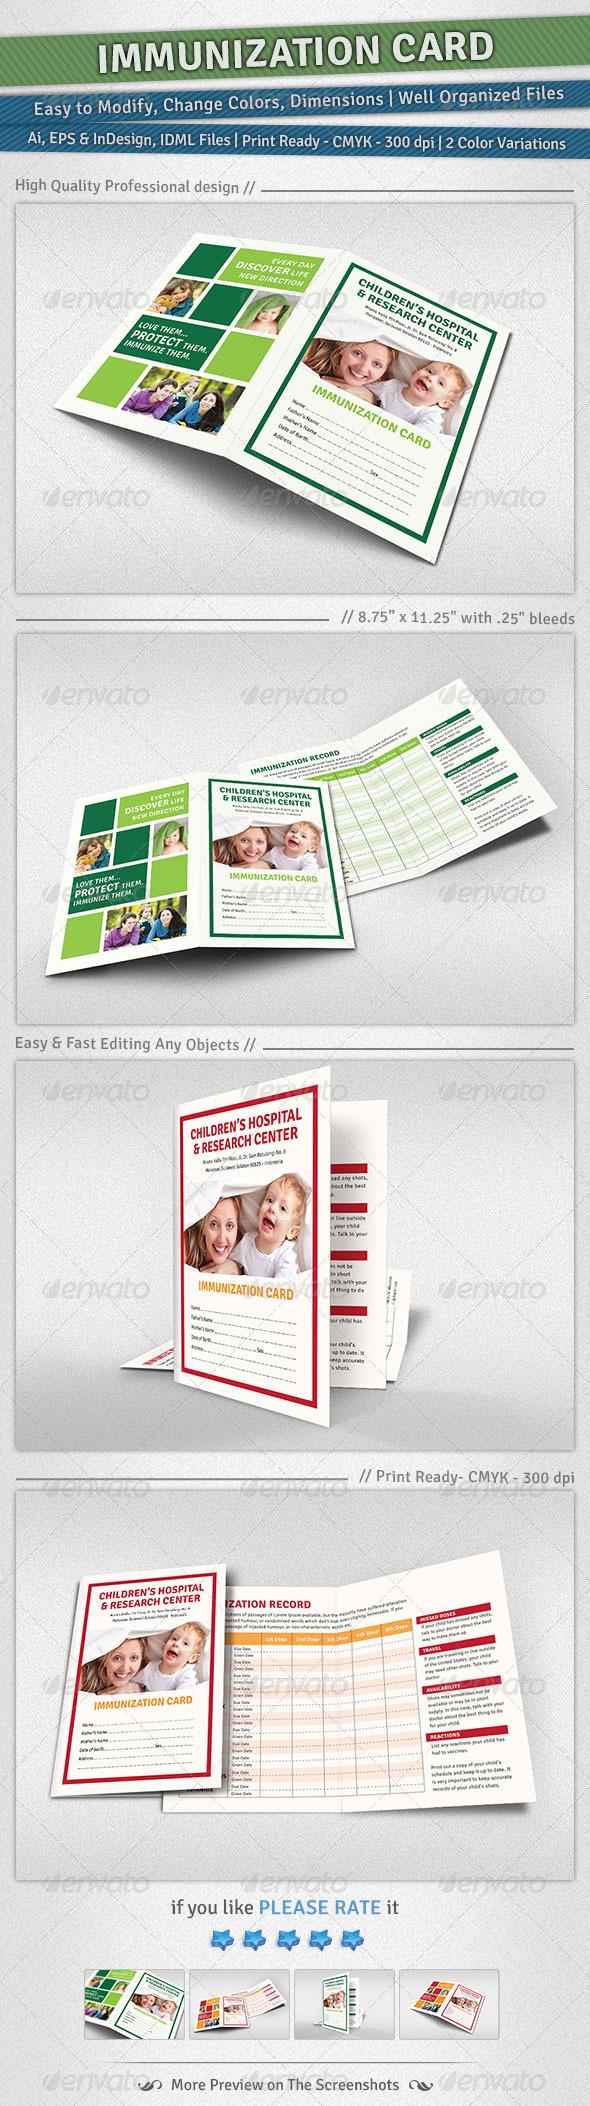 GraphicRiver Immunization Card 4959243